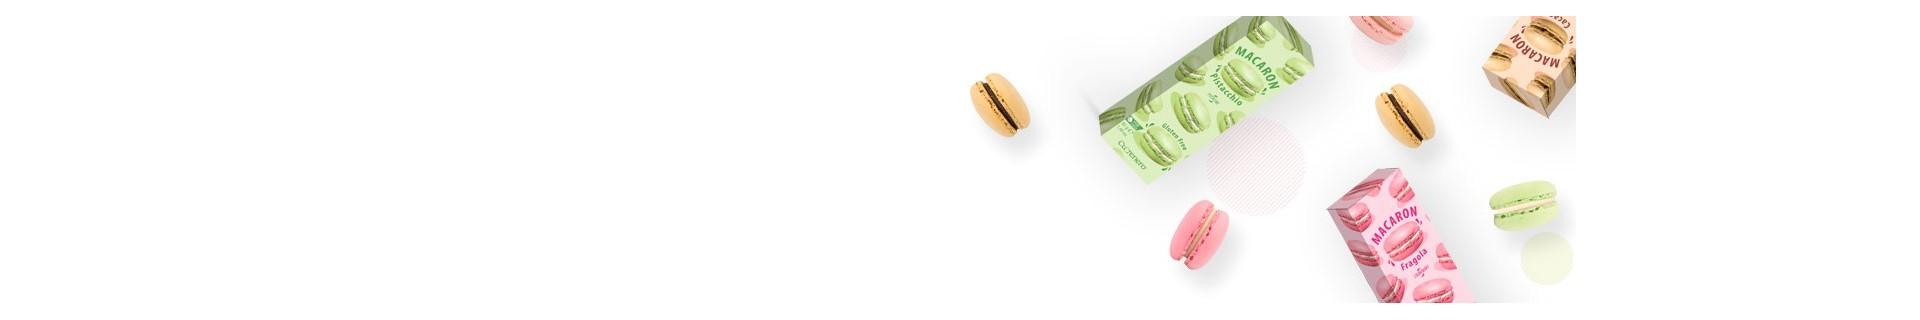 box 6 macaron